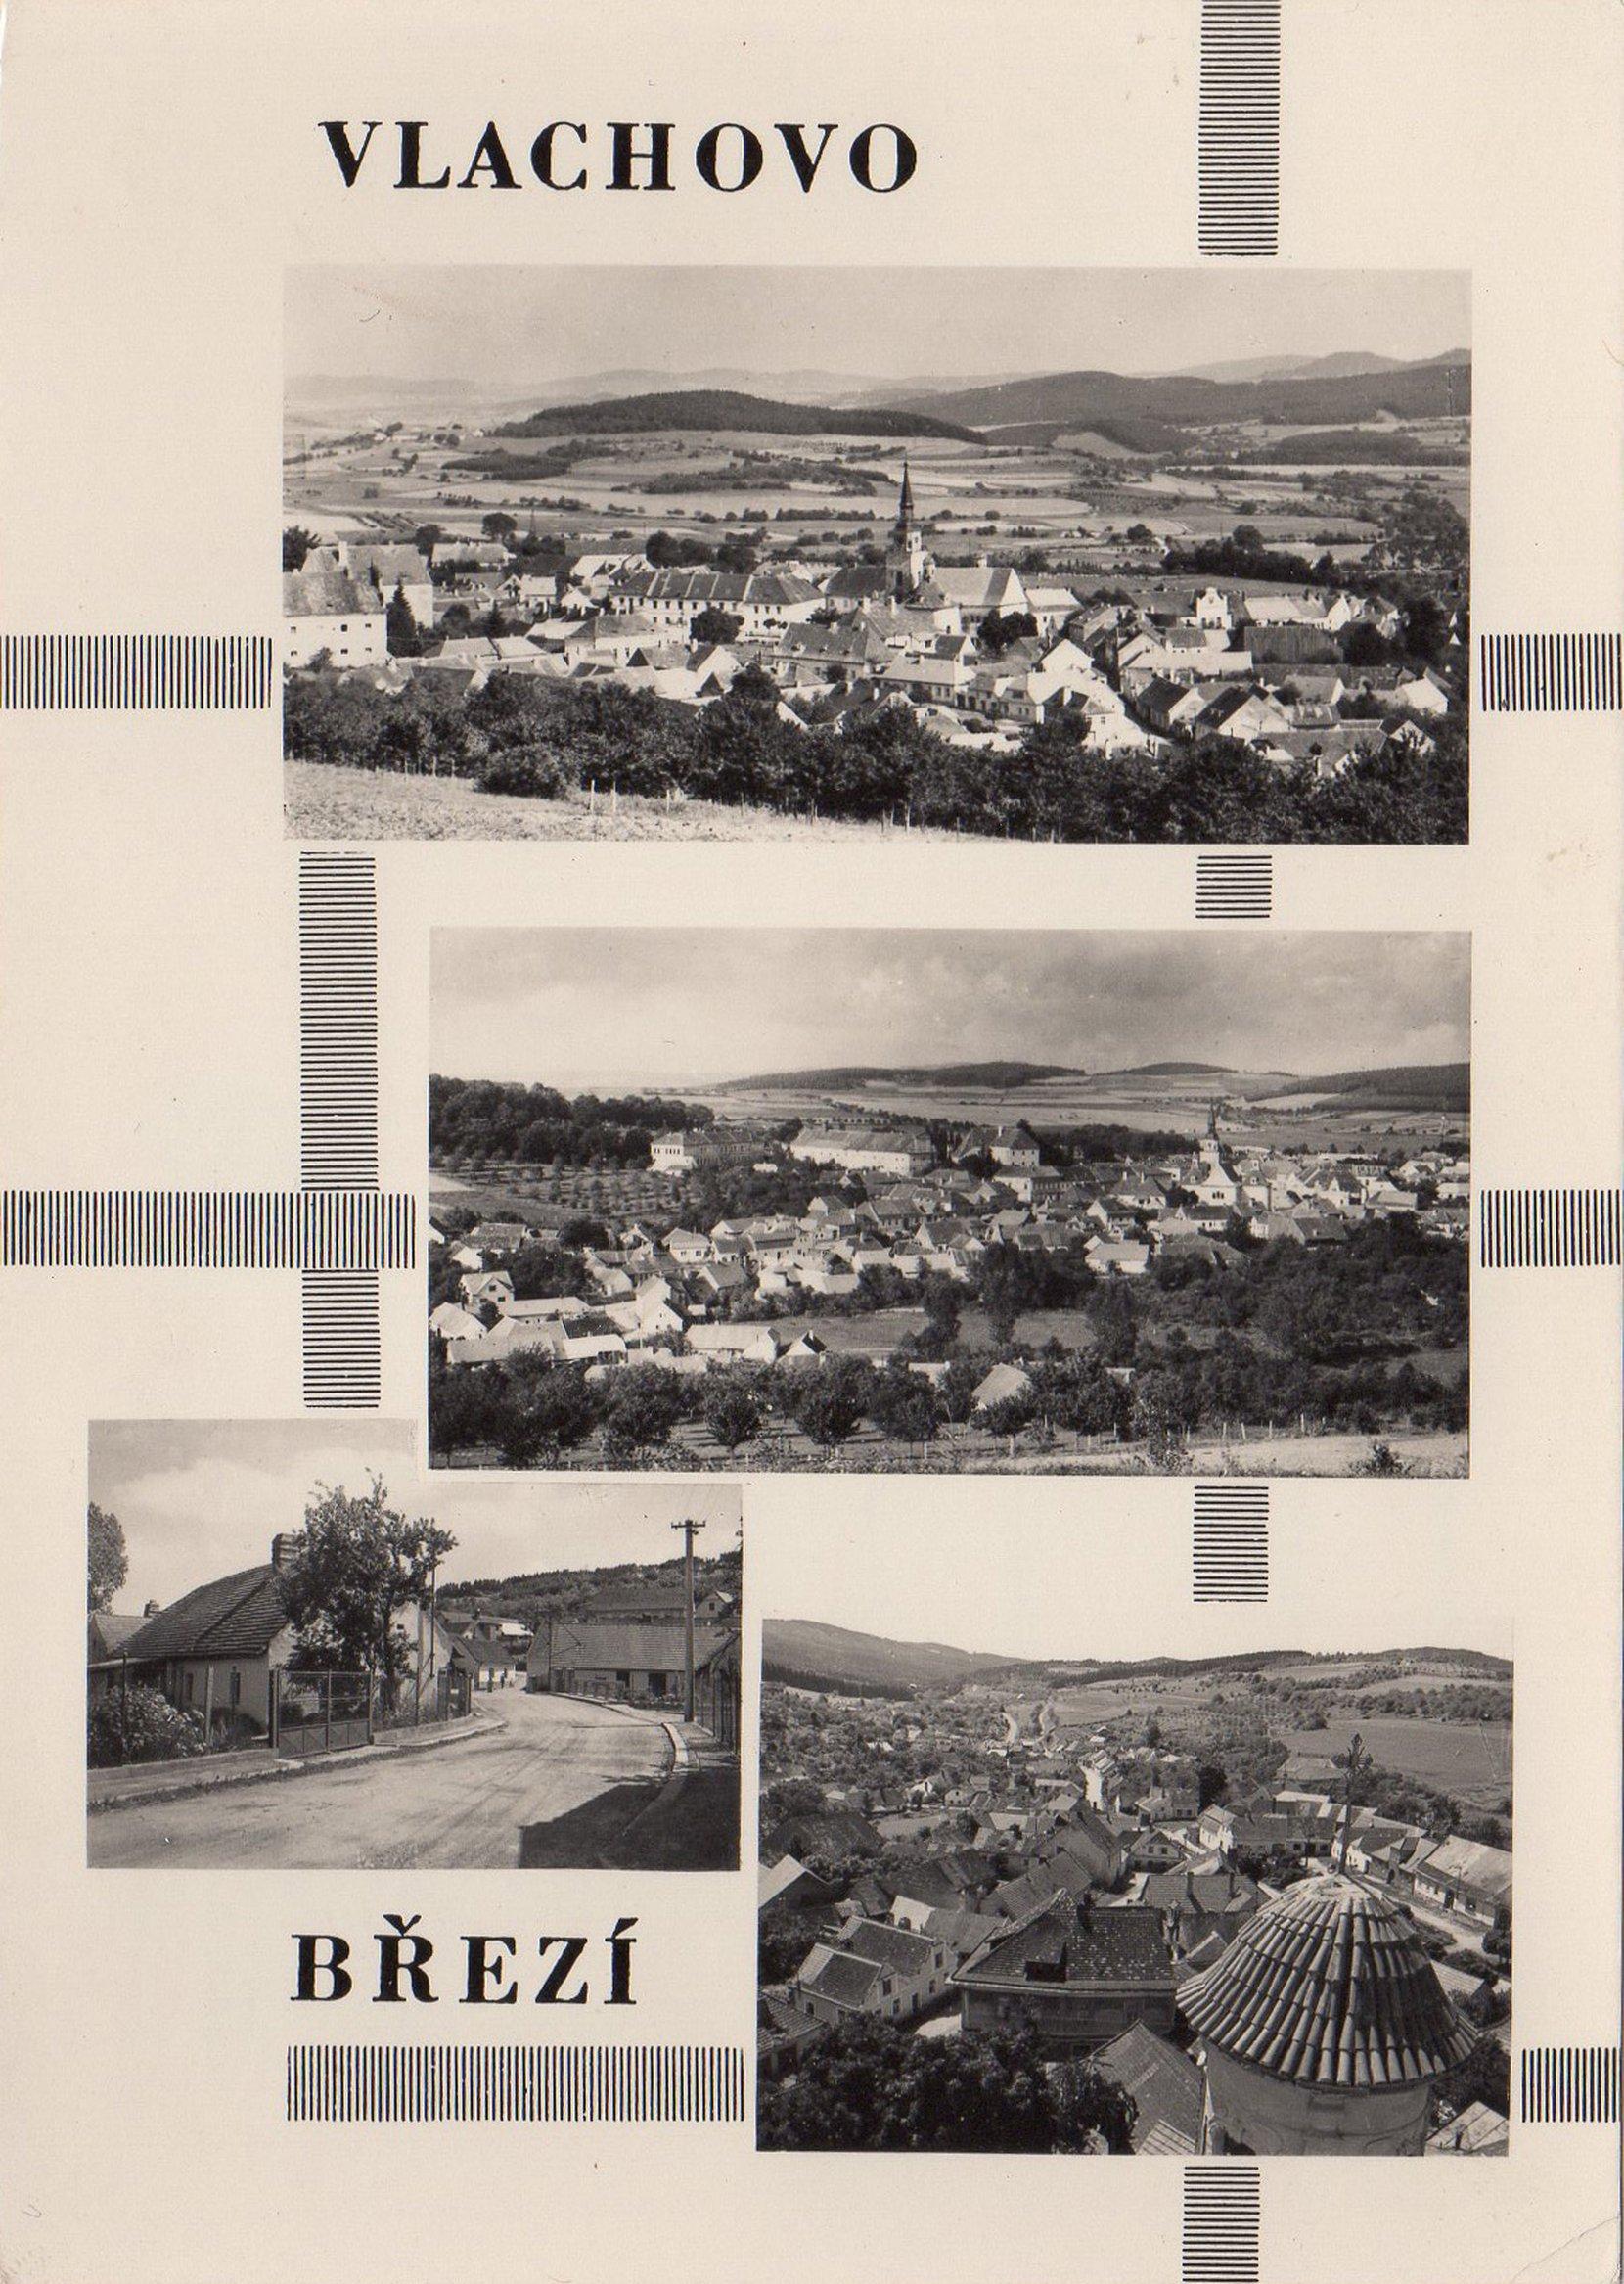 vlachovo březí (czech republic) postcards standard – printed card